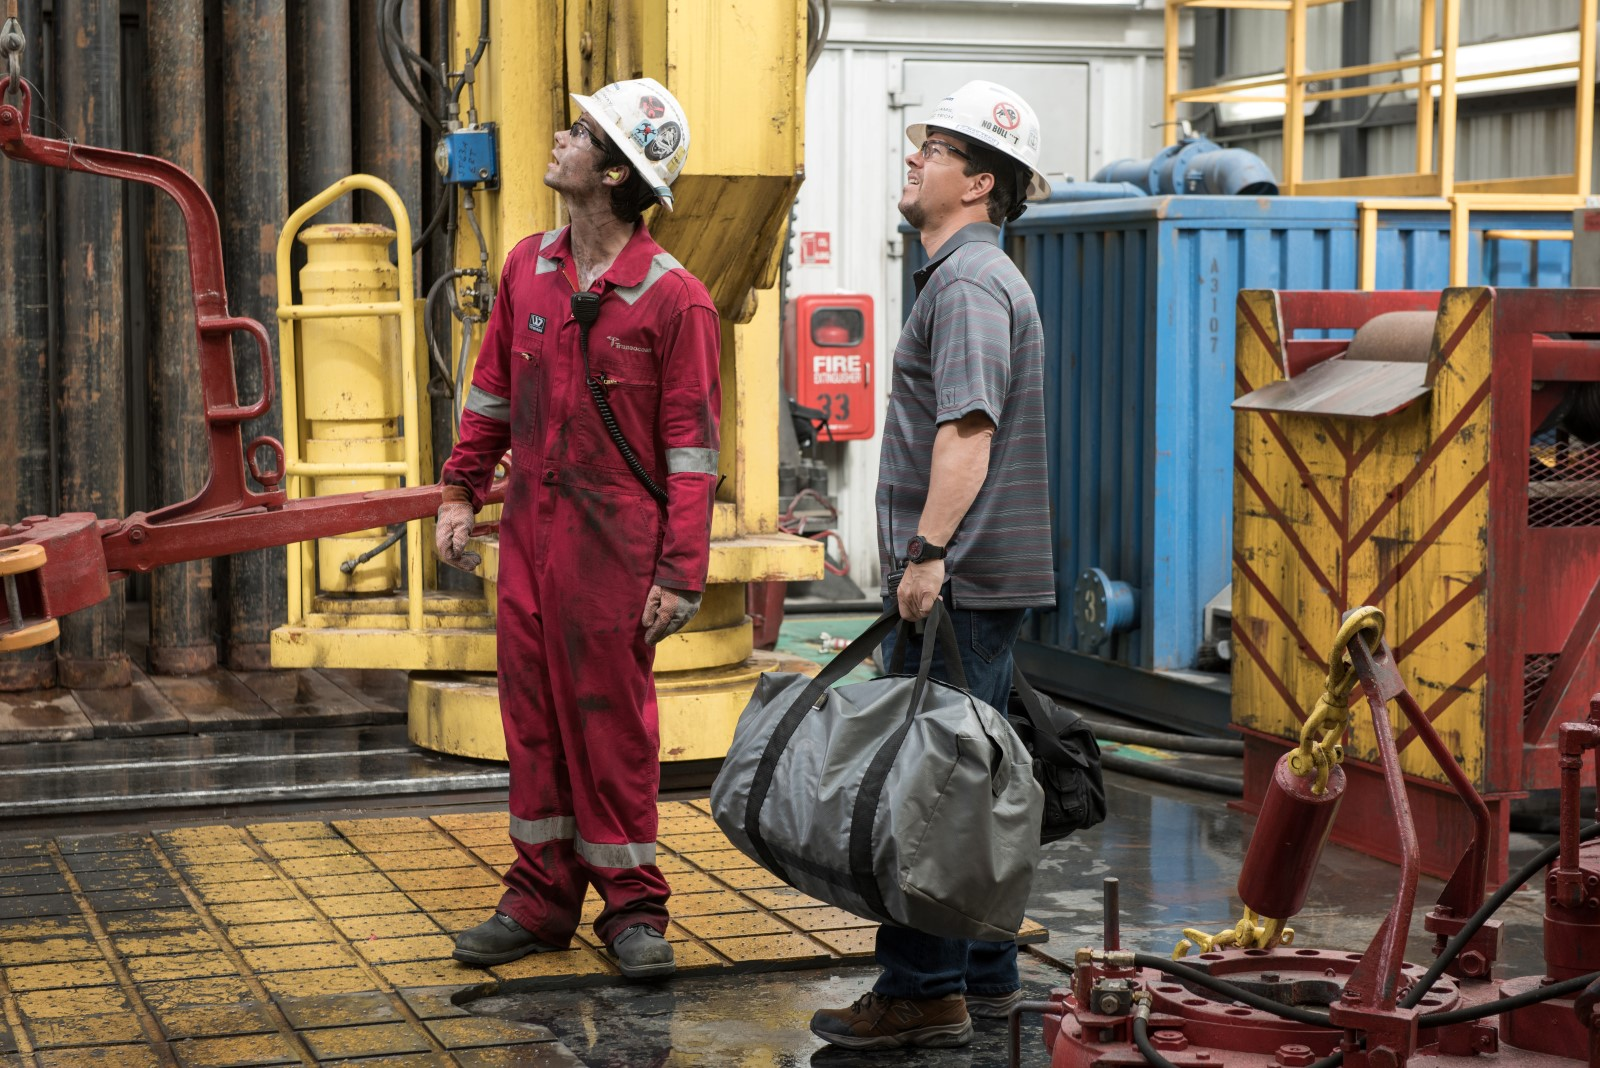 deepwater_horizon_final Crítica: Horizonte Profundo - Desastre no Golfo (Deepwater Horizon)